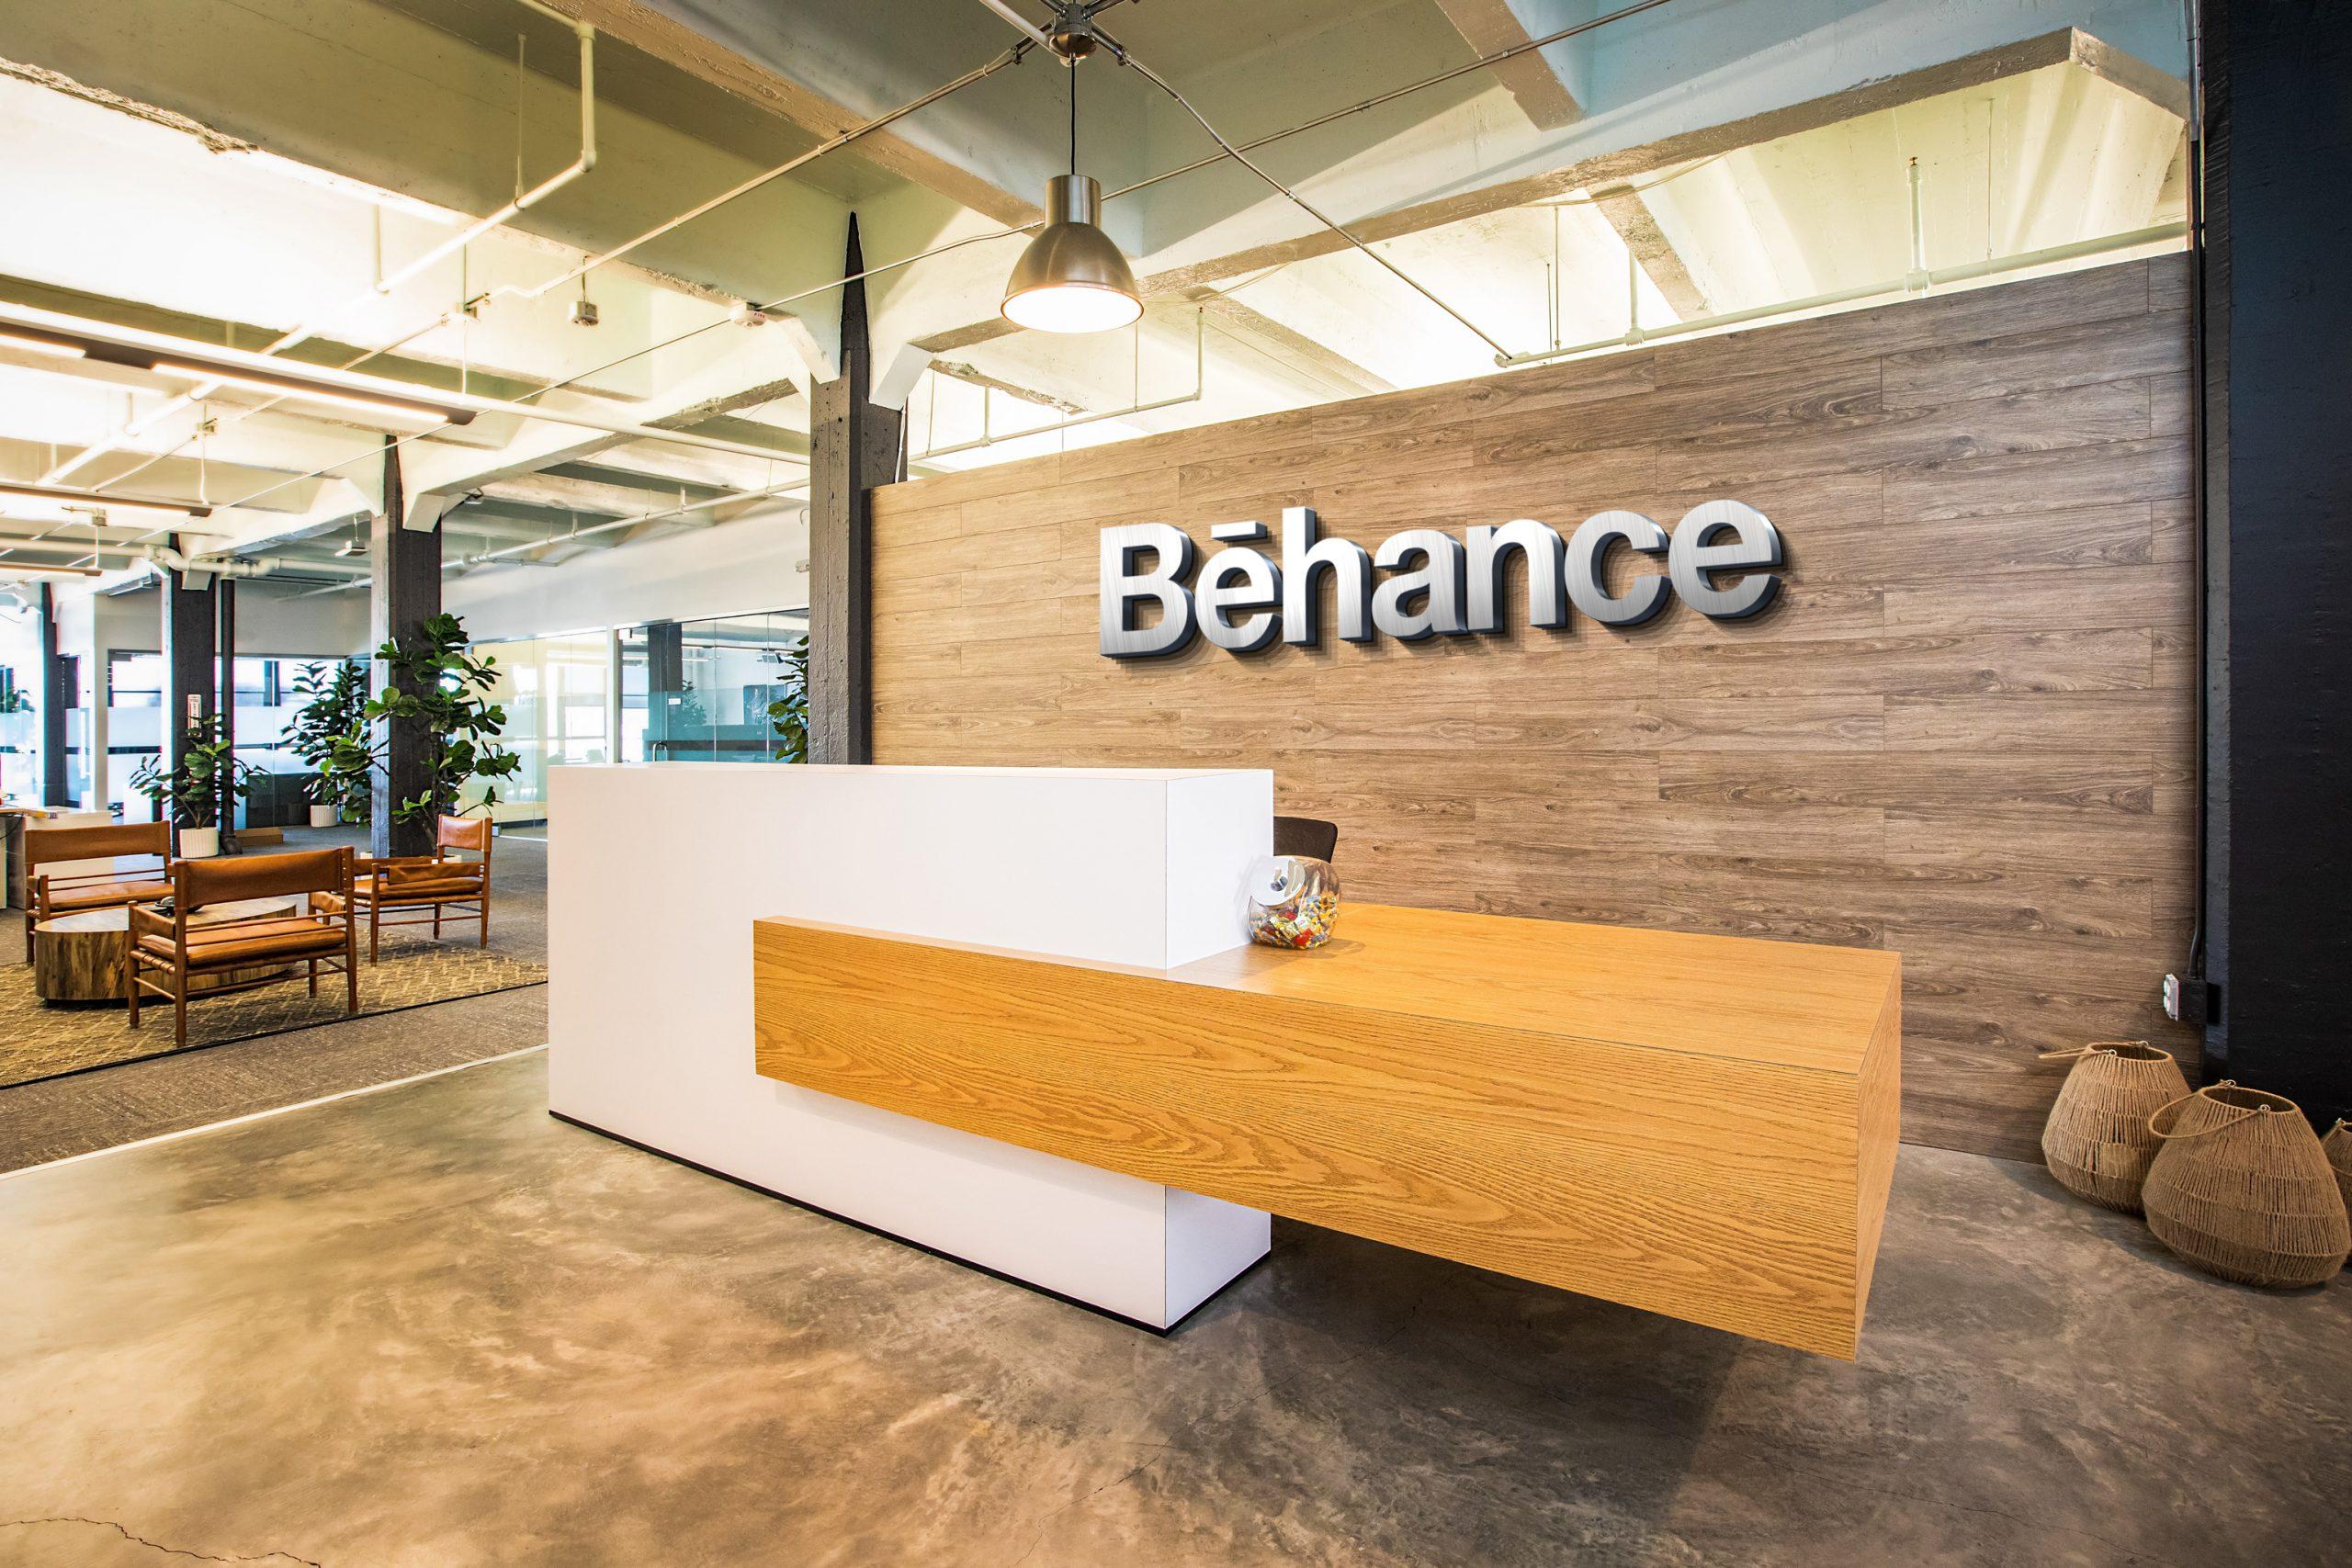 Behance-Logo-Free Reception Desk Mockup